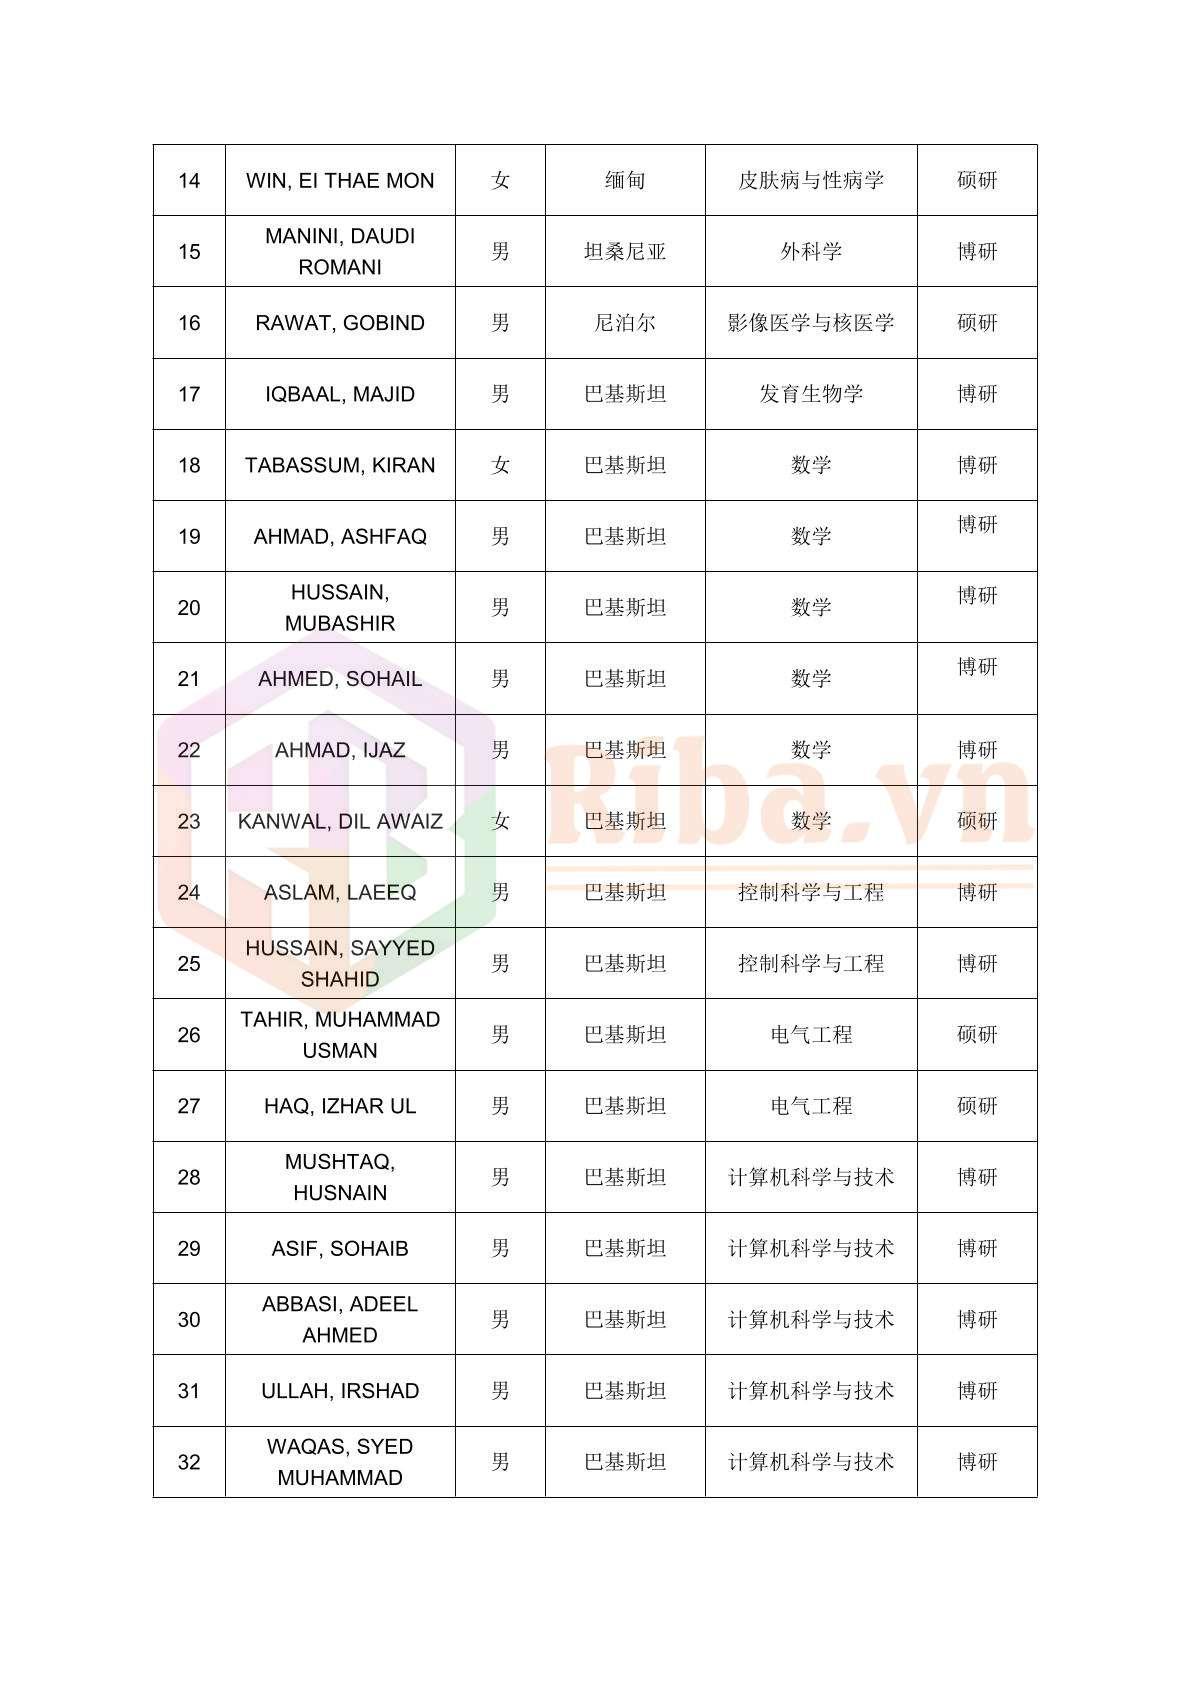 Danh Sach Do Hoc Bong Csc Dai Hoc Trung Nam 2020 02 2021